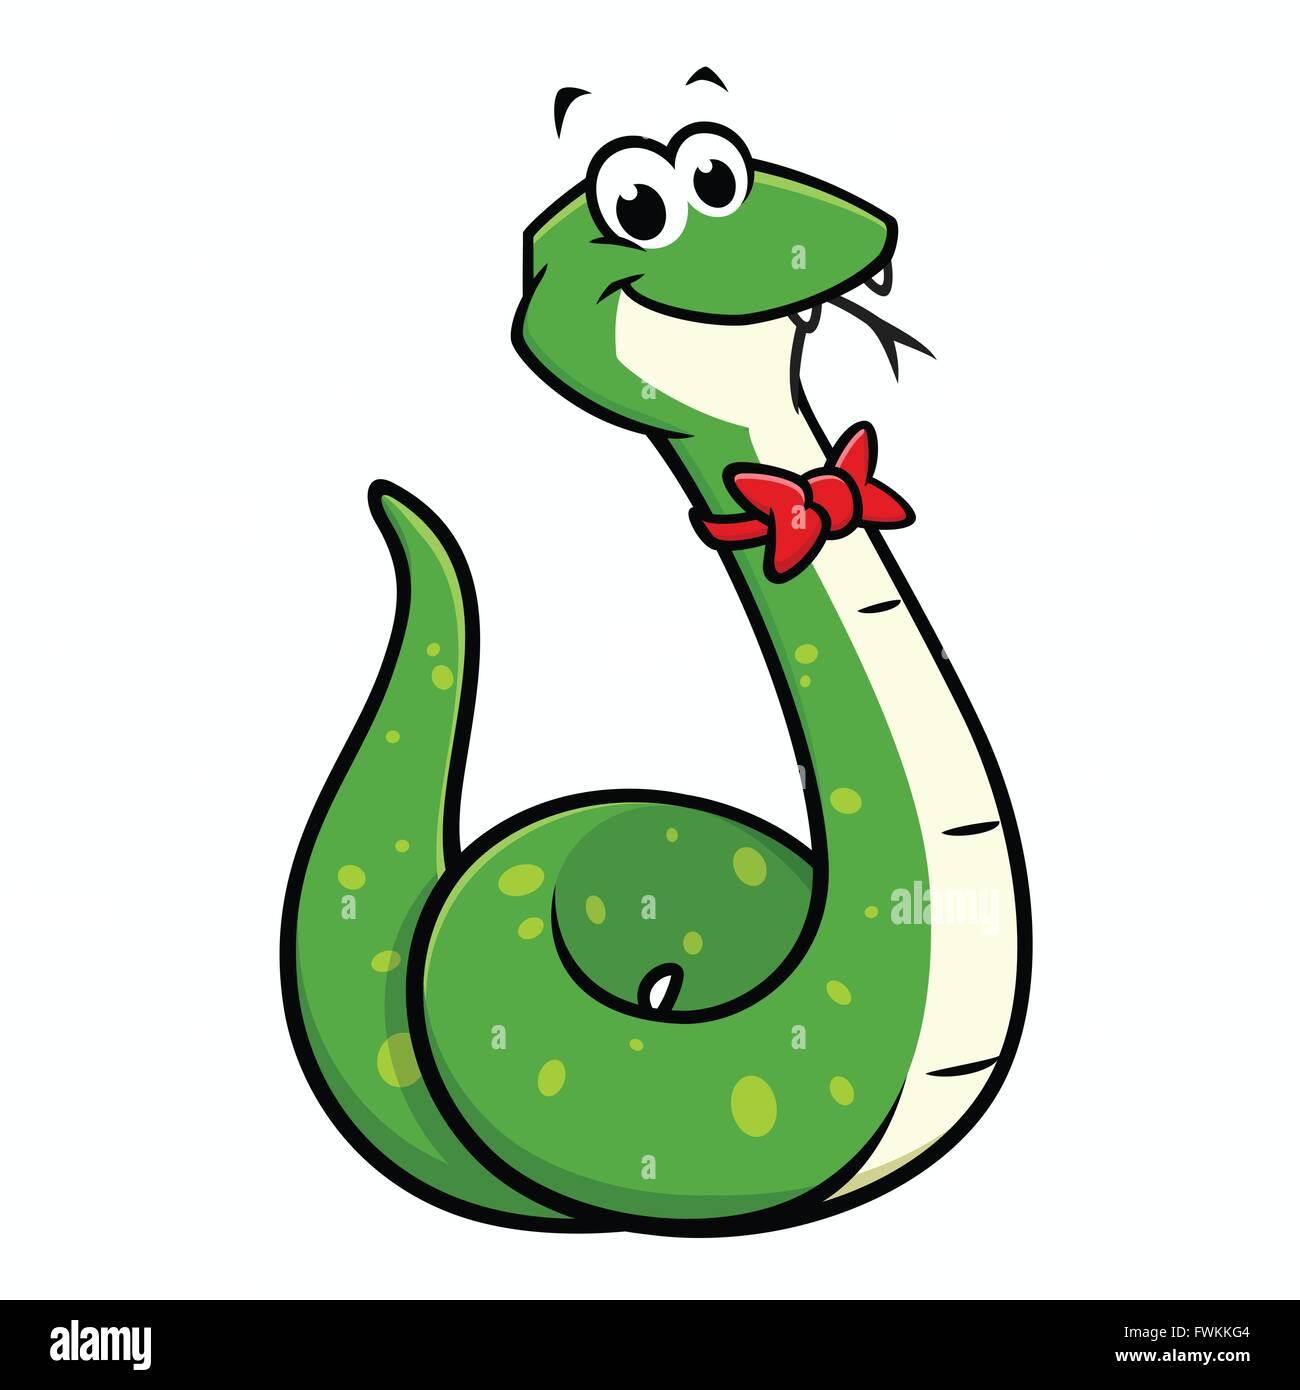 Funny Cartoon Snake Stockfotos & Funny Cartoon Snake Bilder - Seite ...